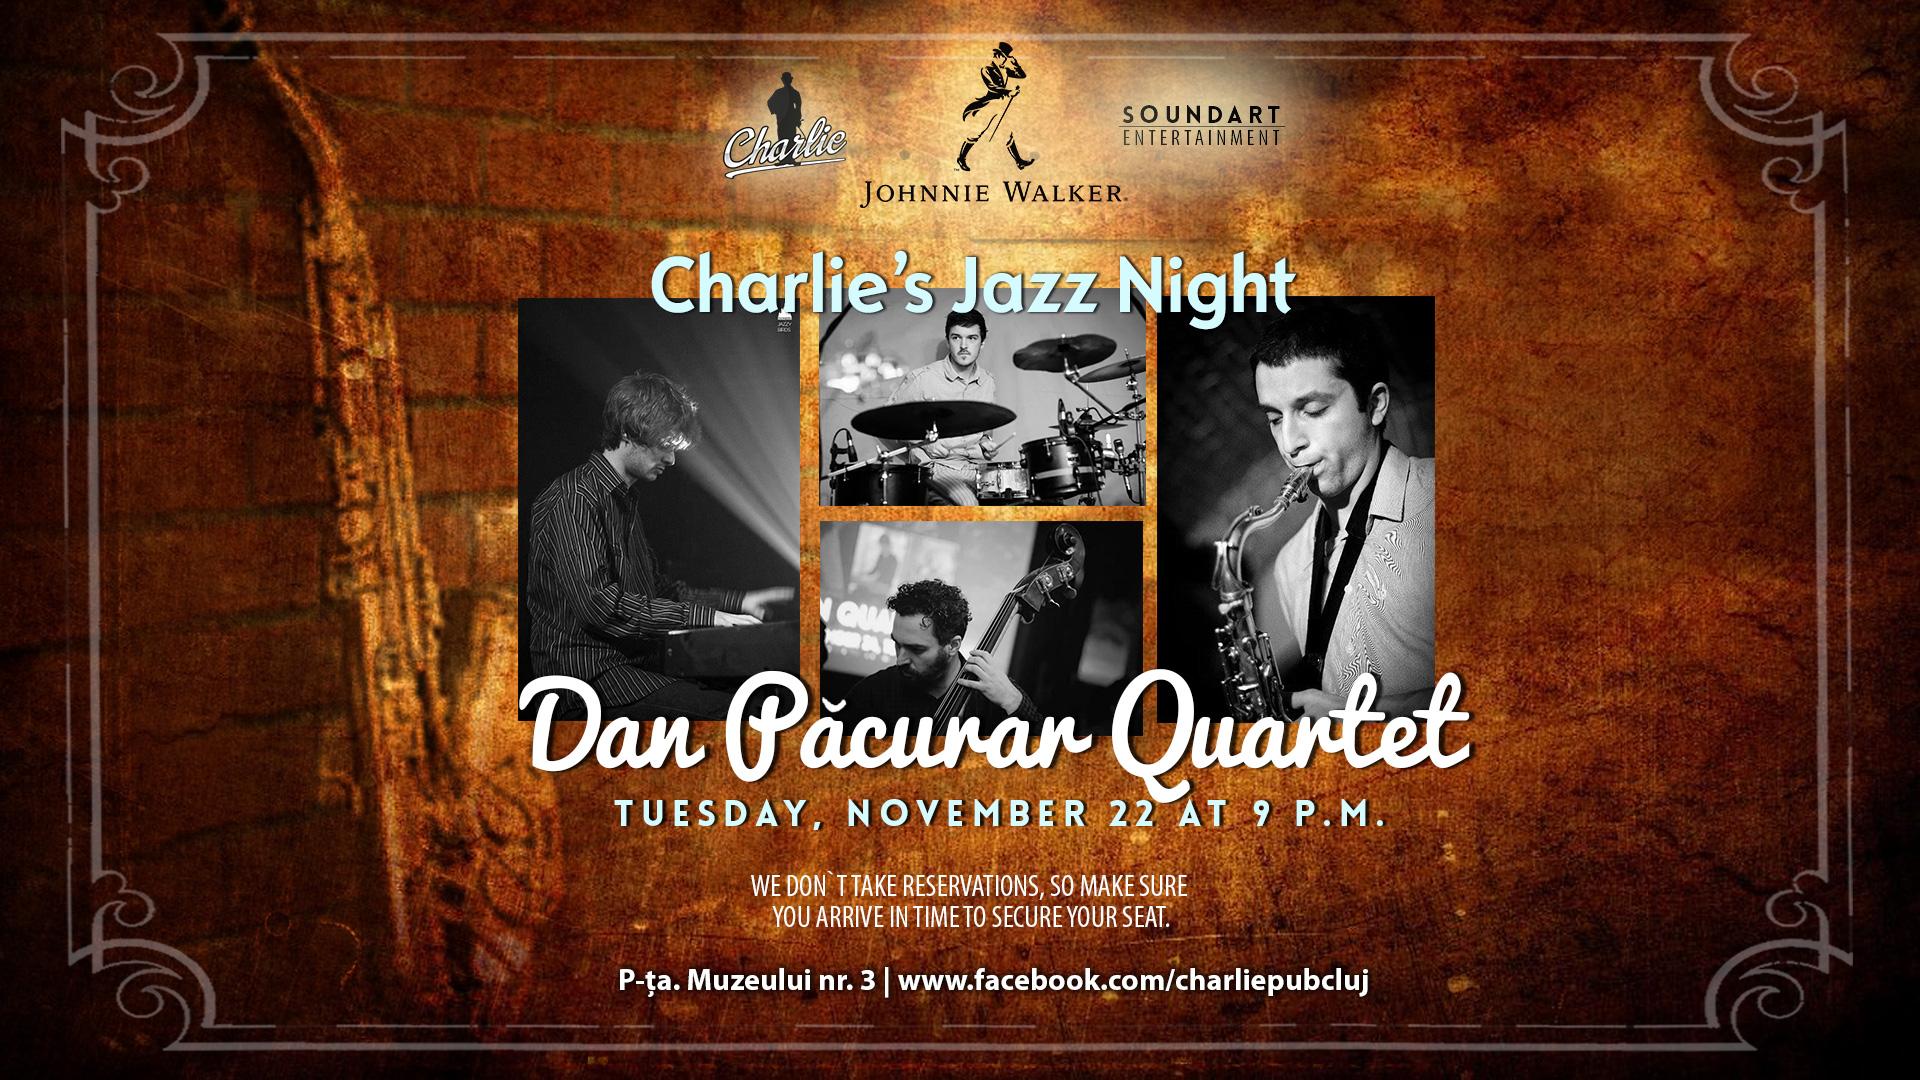 Dan Pacurar Quartet @ Charlie